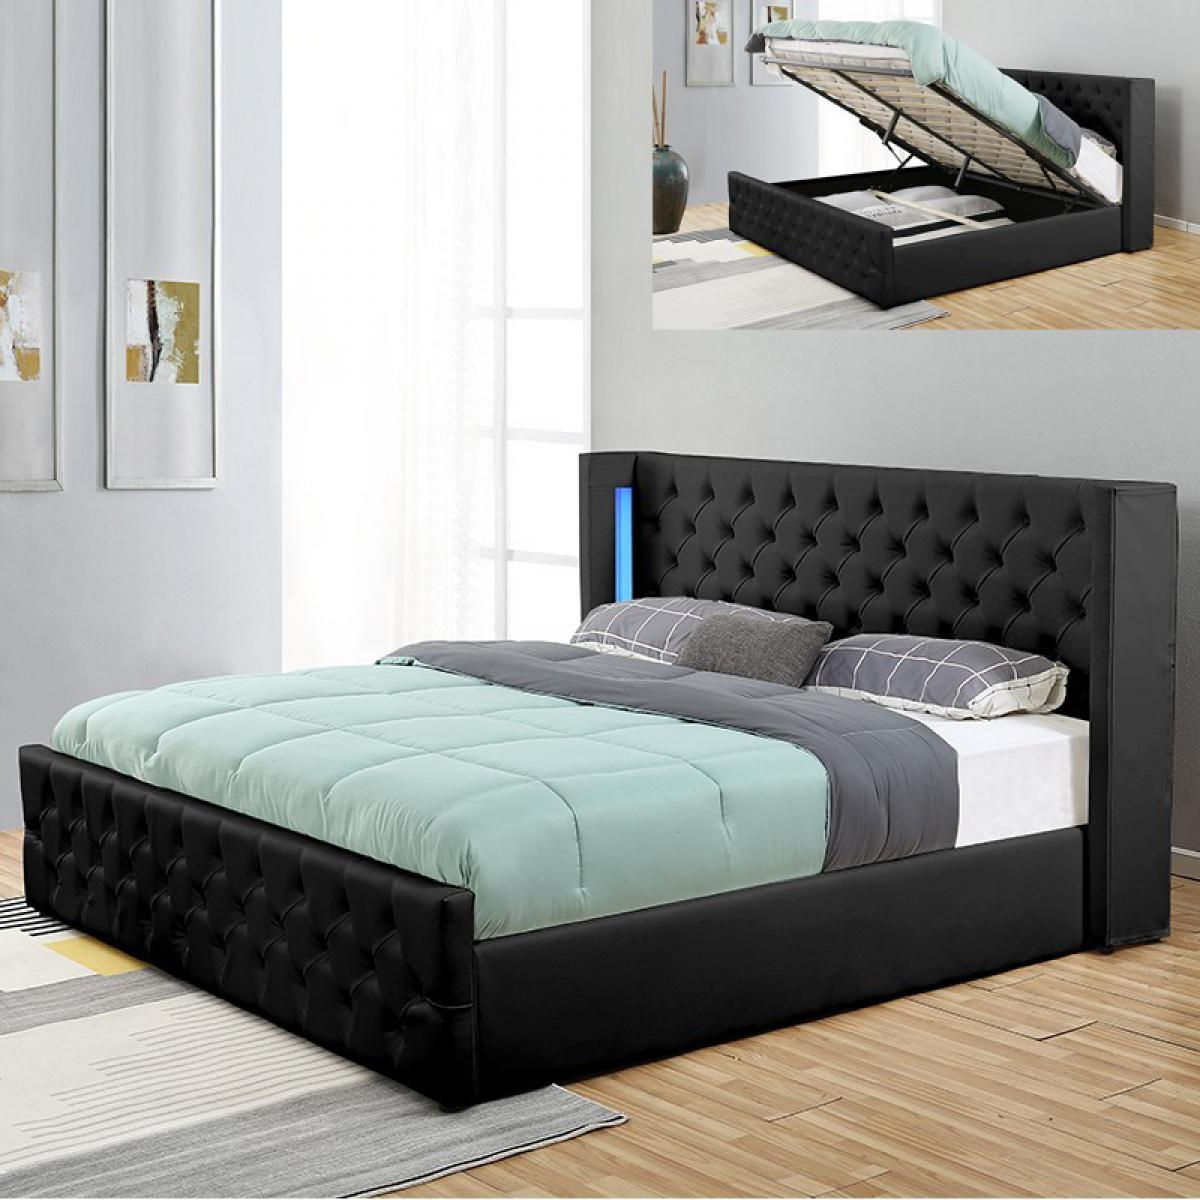 Meubler Design Lit coffre design avec led OSMOS - Noir - 160x200